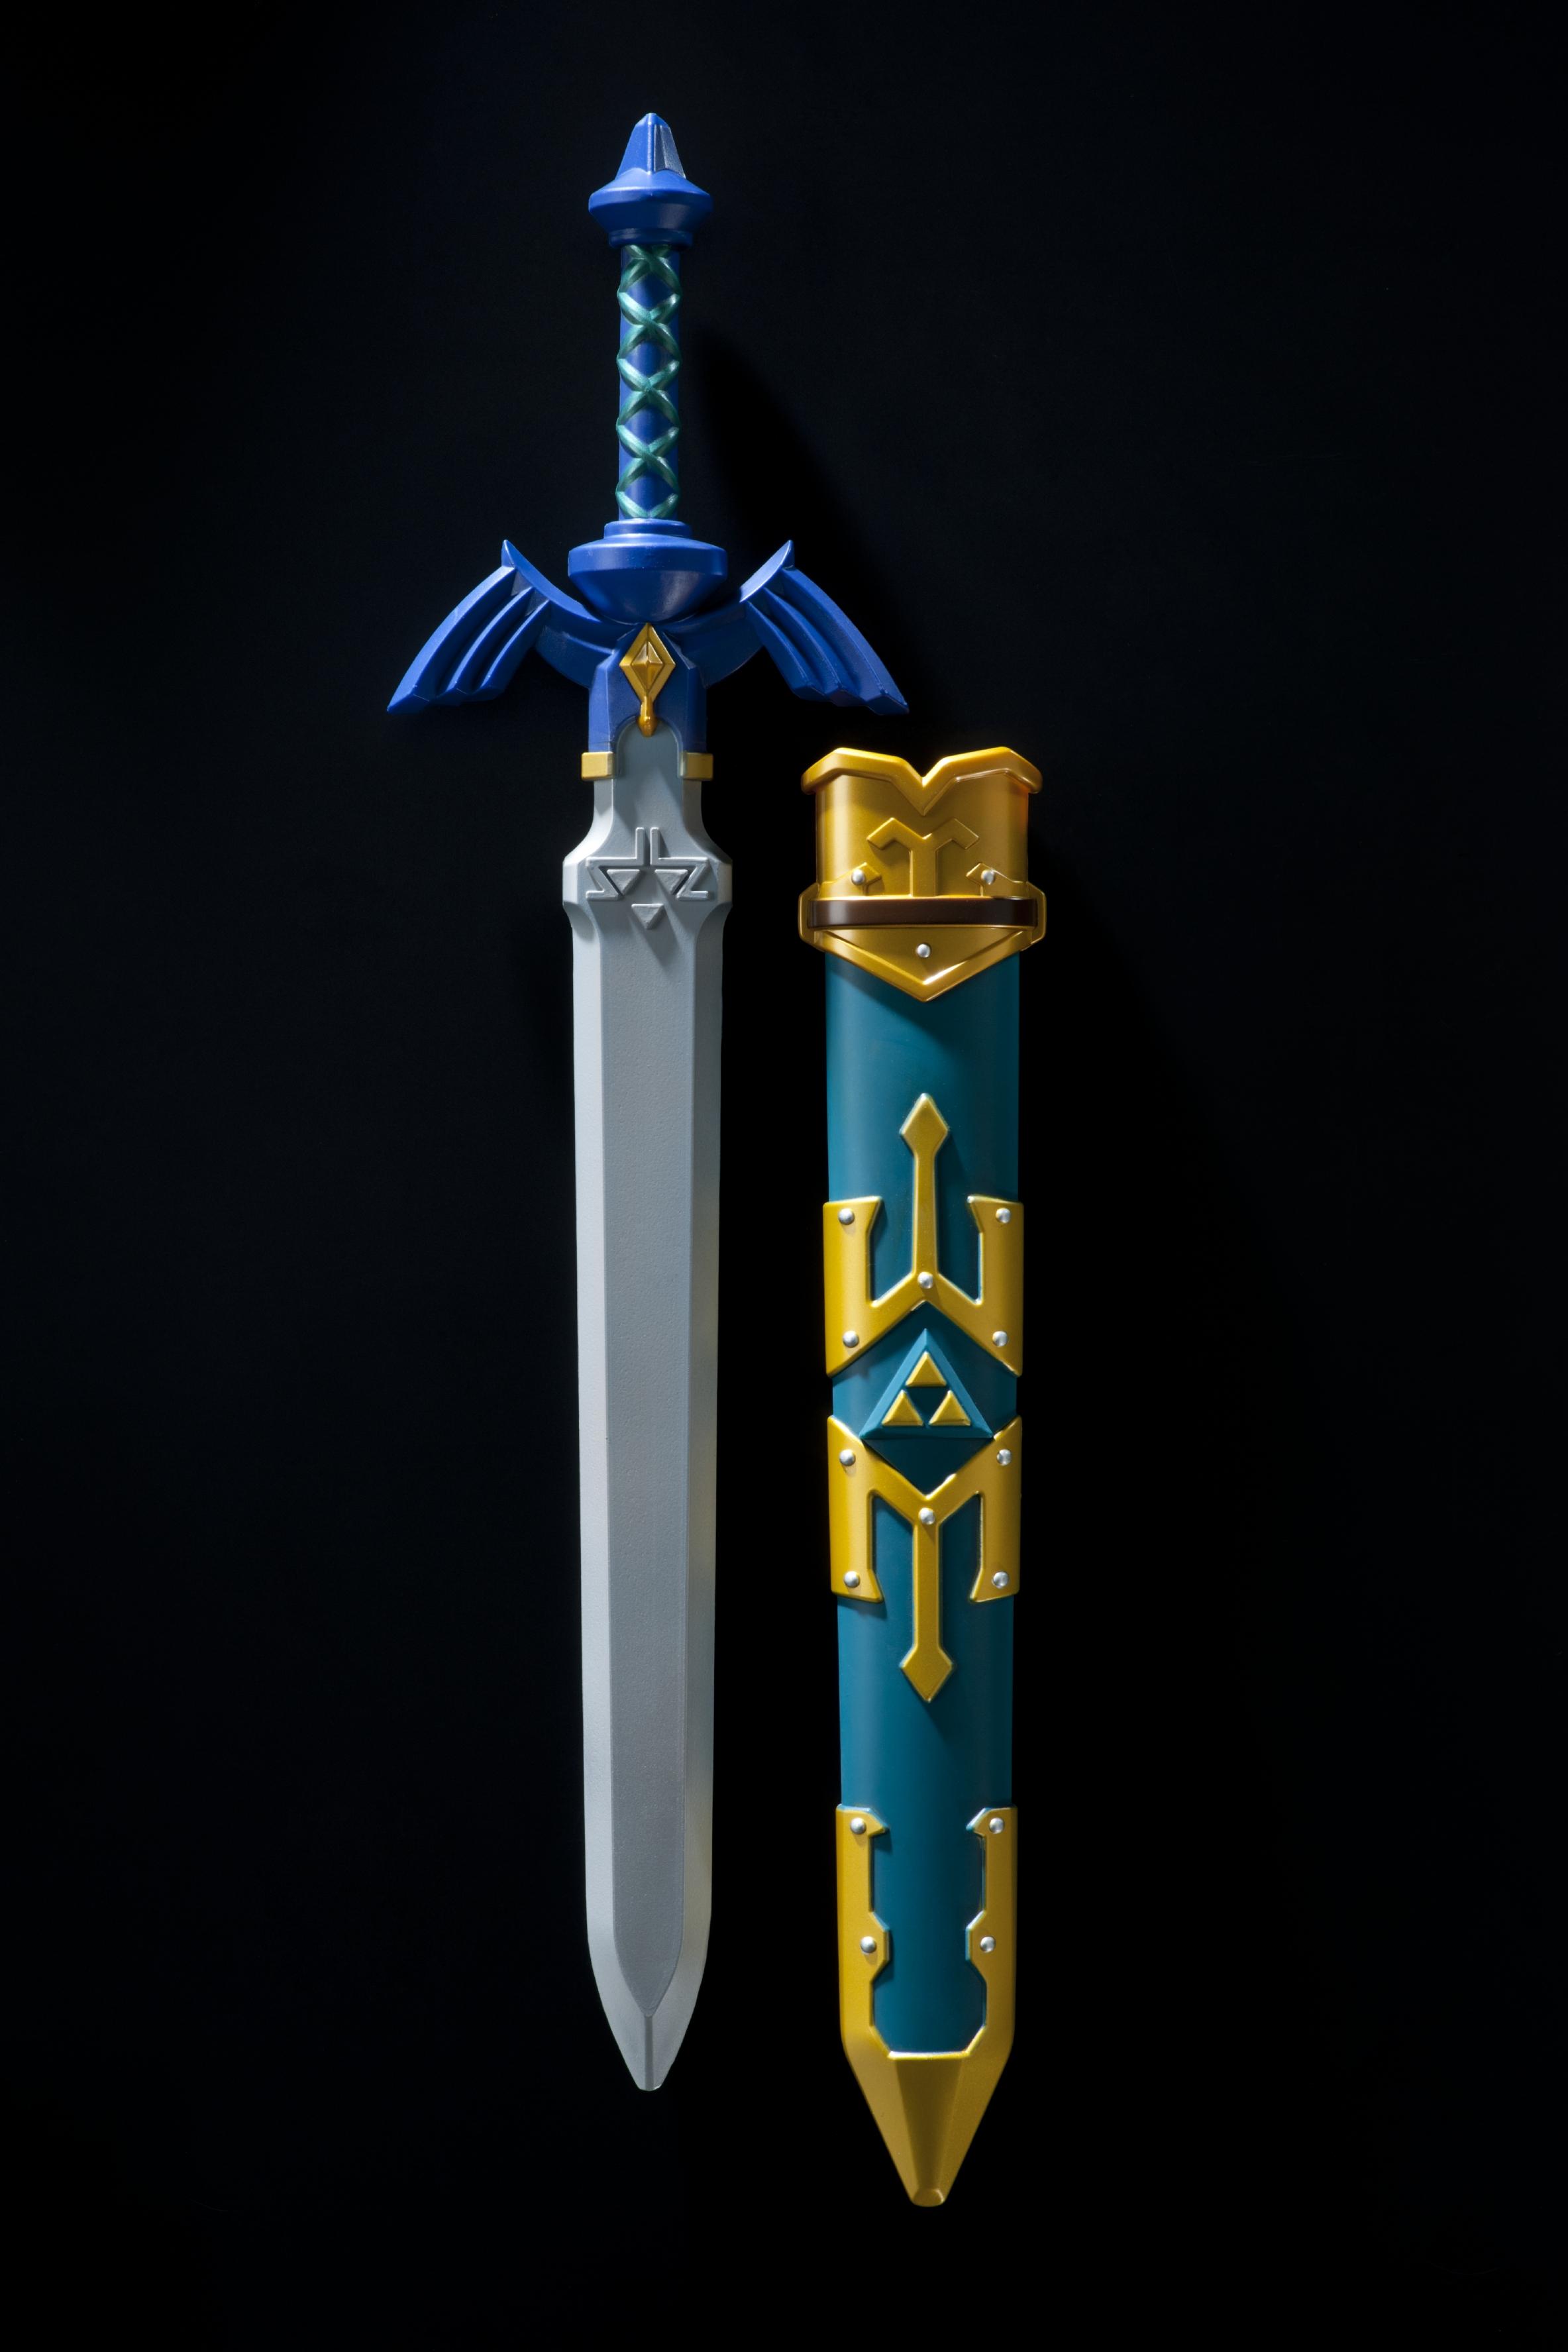 "Lizensierte Replik des Master-Schwerts aus ""The Legend of Zelda"". Nintendo, 2017. (c) Landesmuseum Württemberg, Stuttgart. Foto: Hendrik Zwietasch"